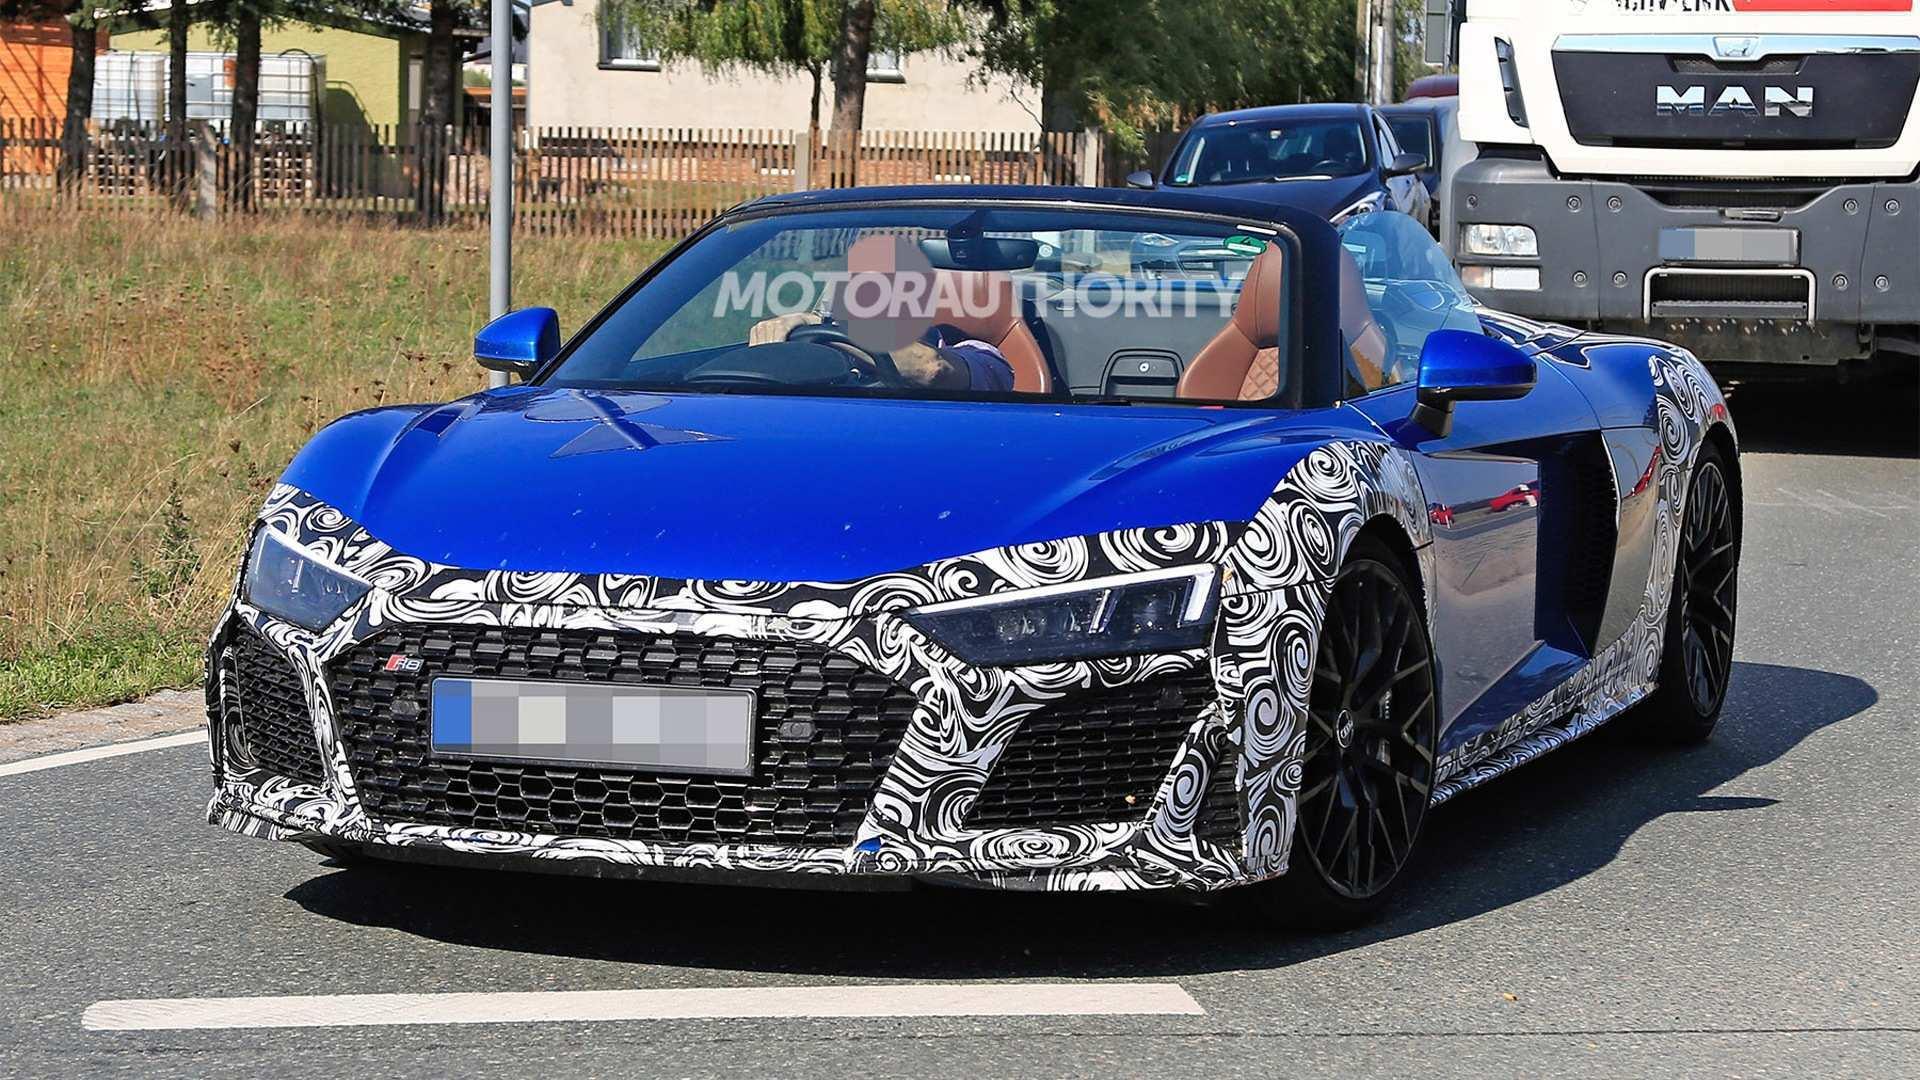 88 All New 2020 Audi R8 V10 Spyder Speed Test with 2020 Audi R8 V10 Spyder